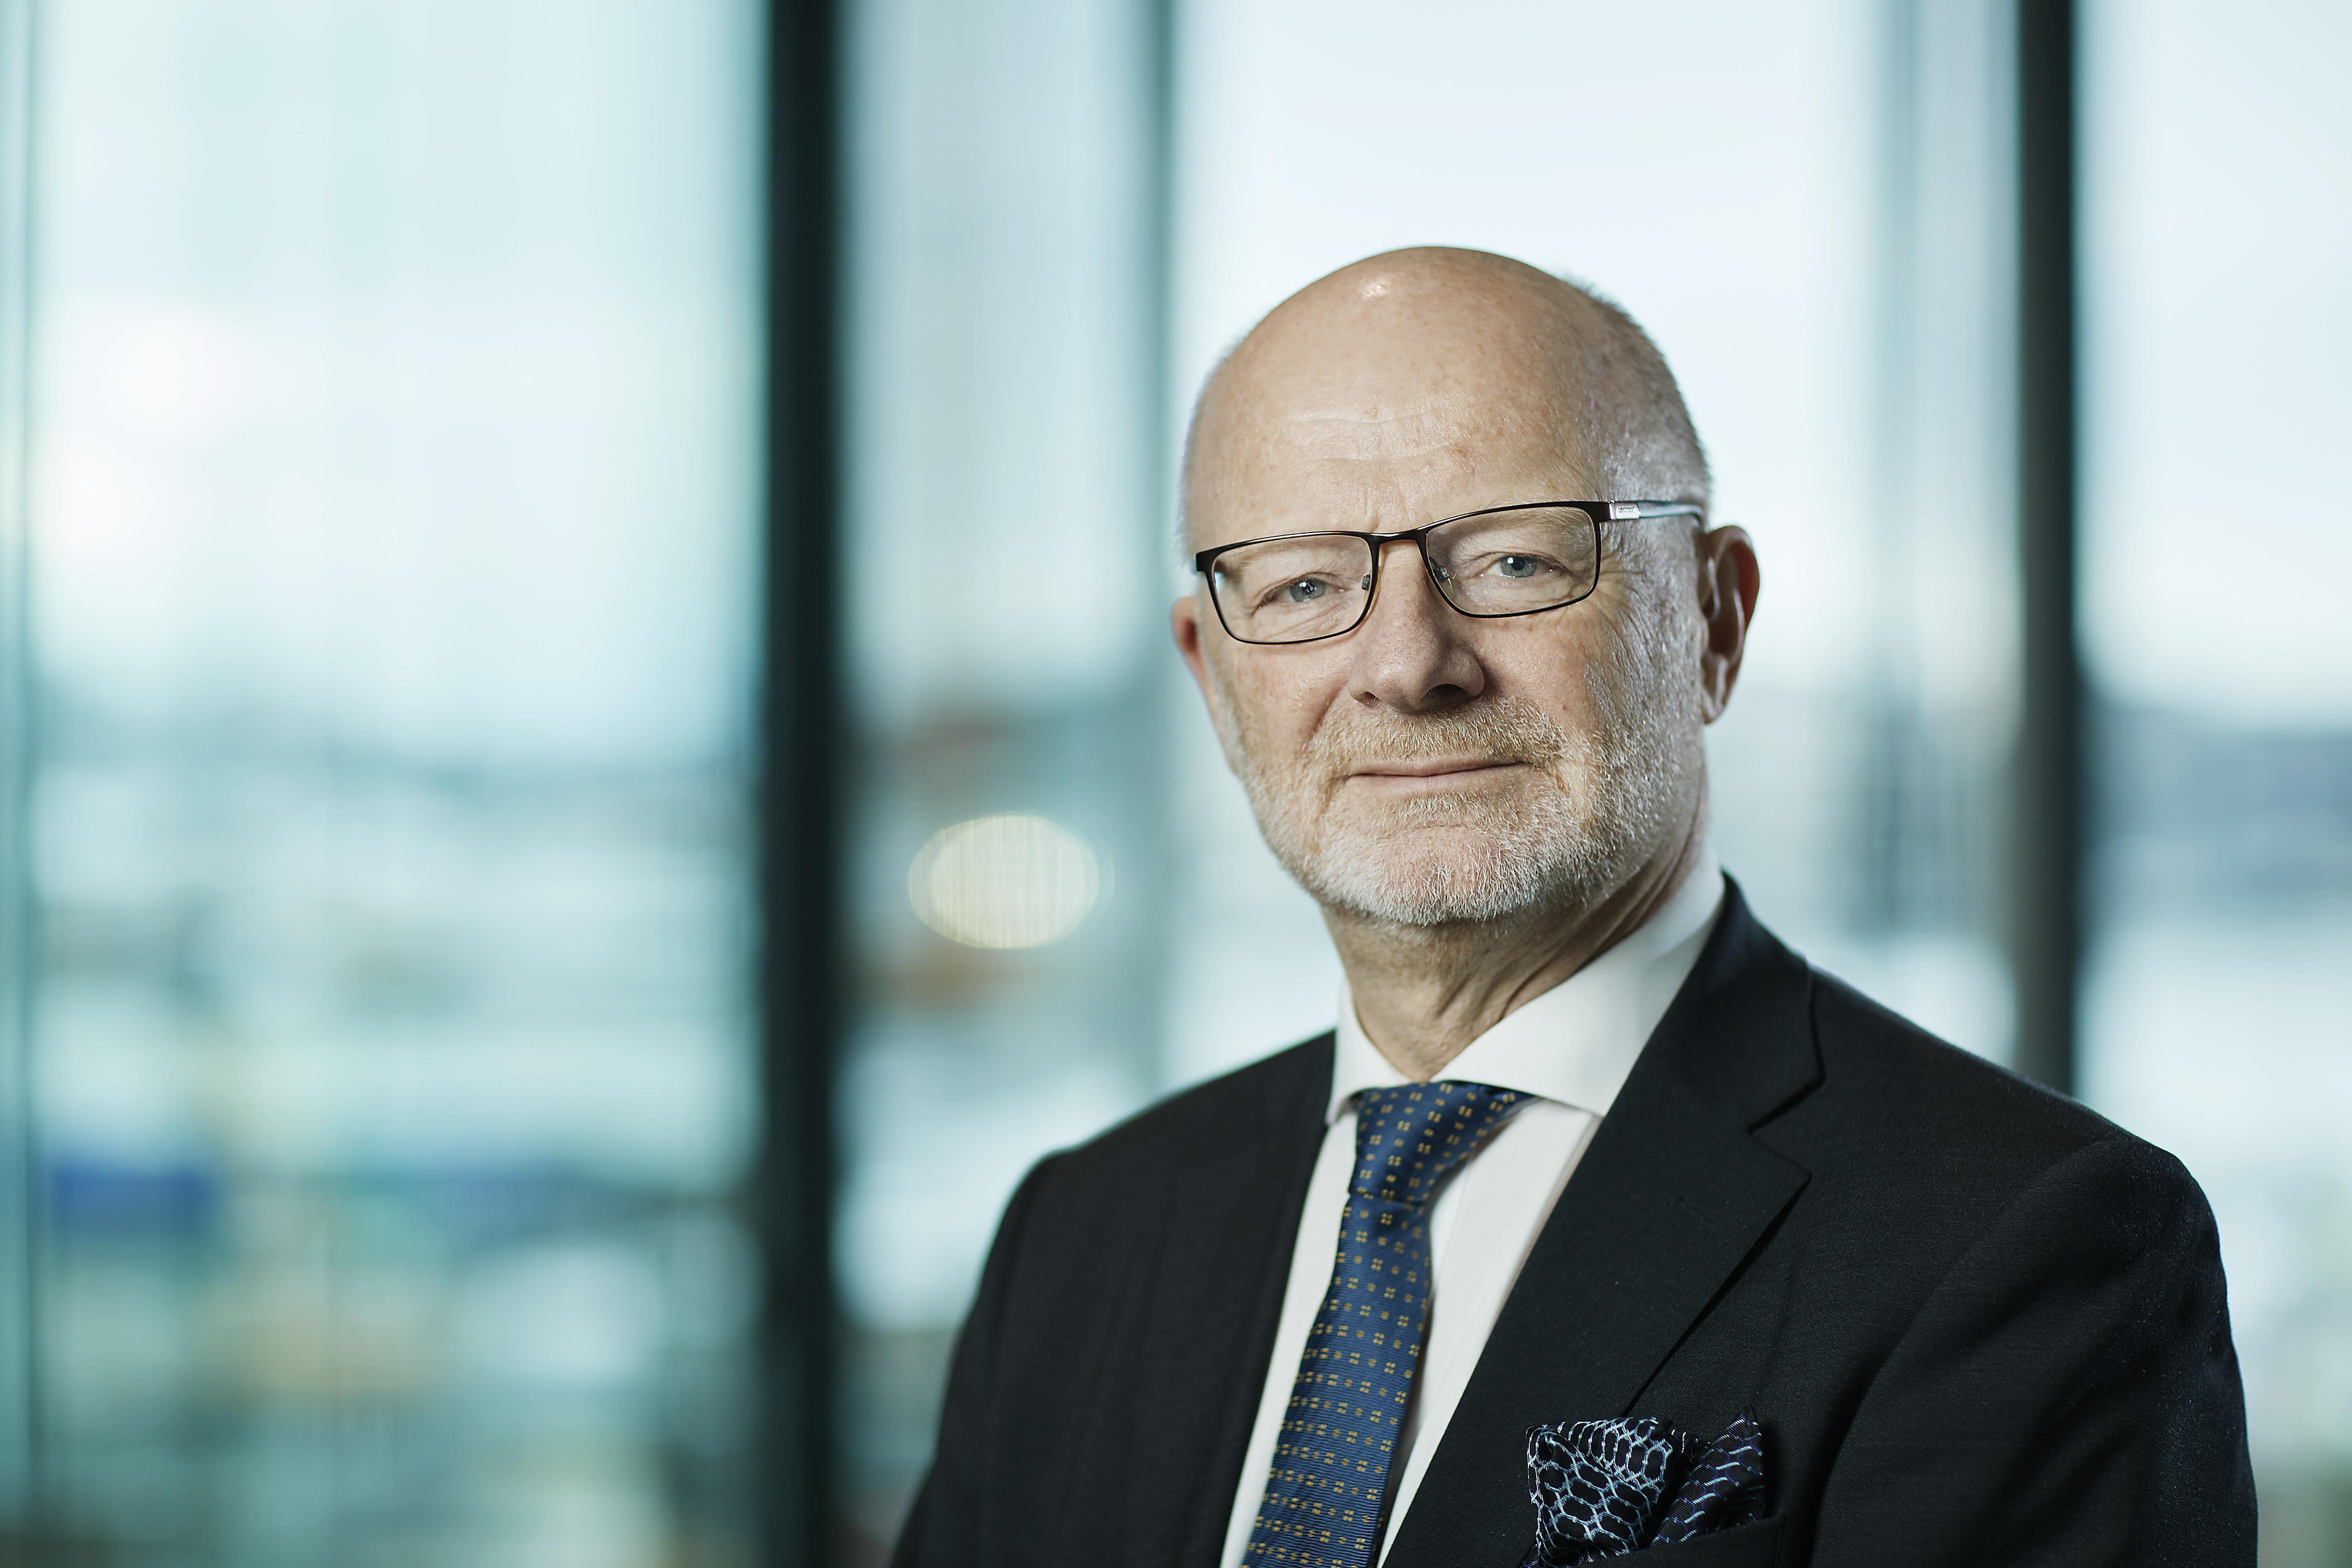 Portrettfotografi av styremedlem Erling Sæther